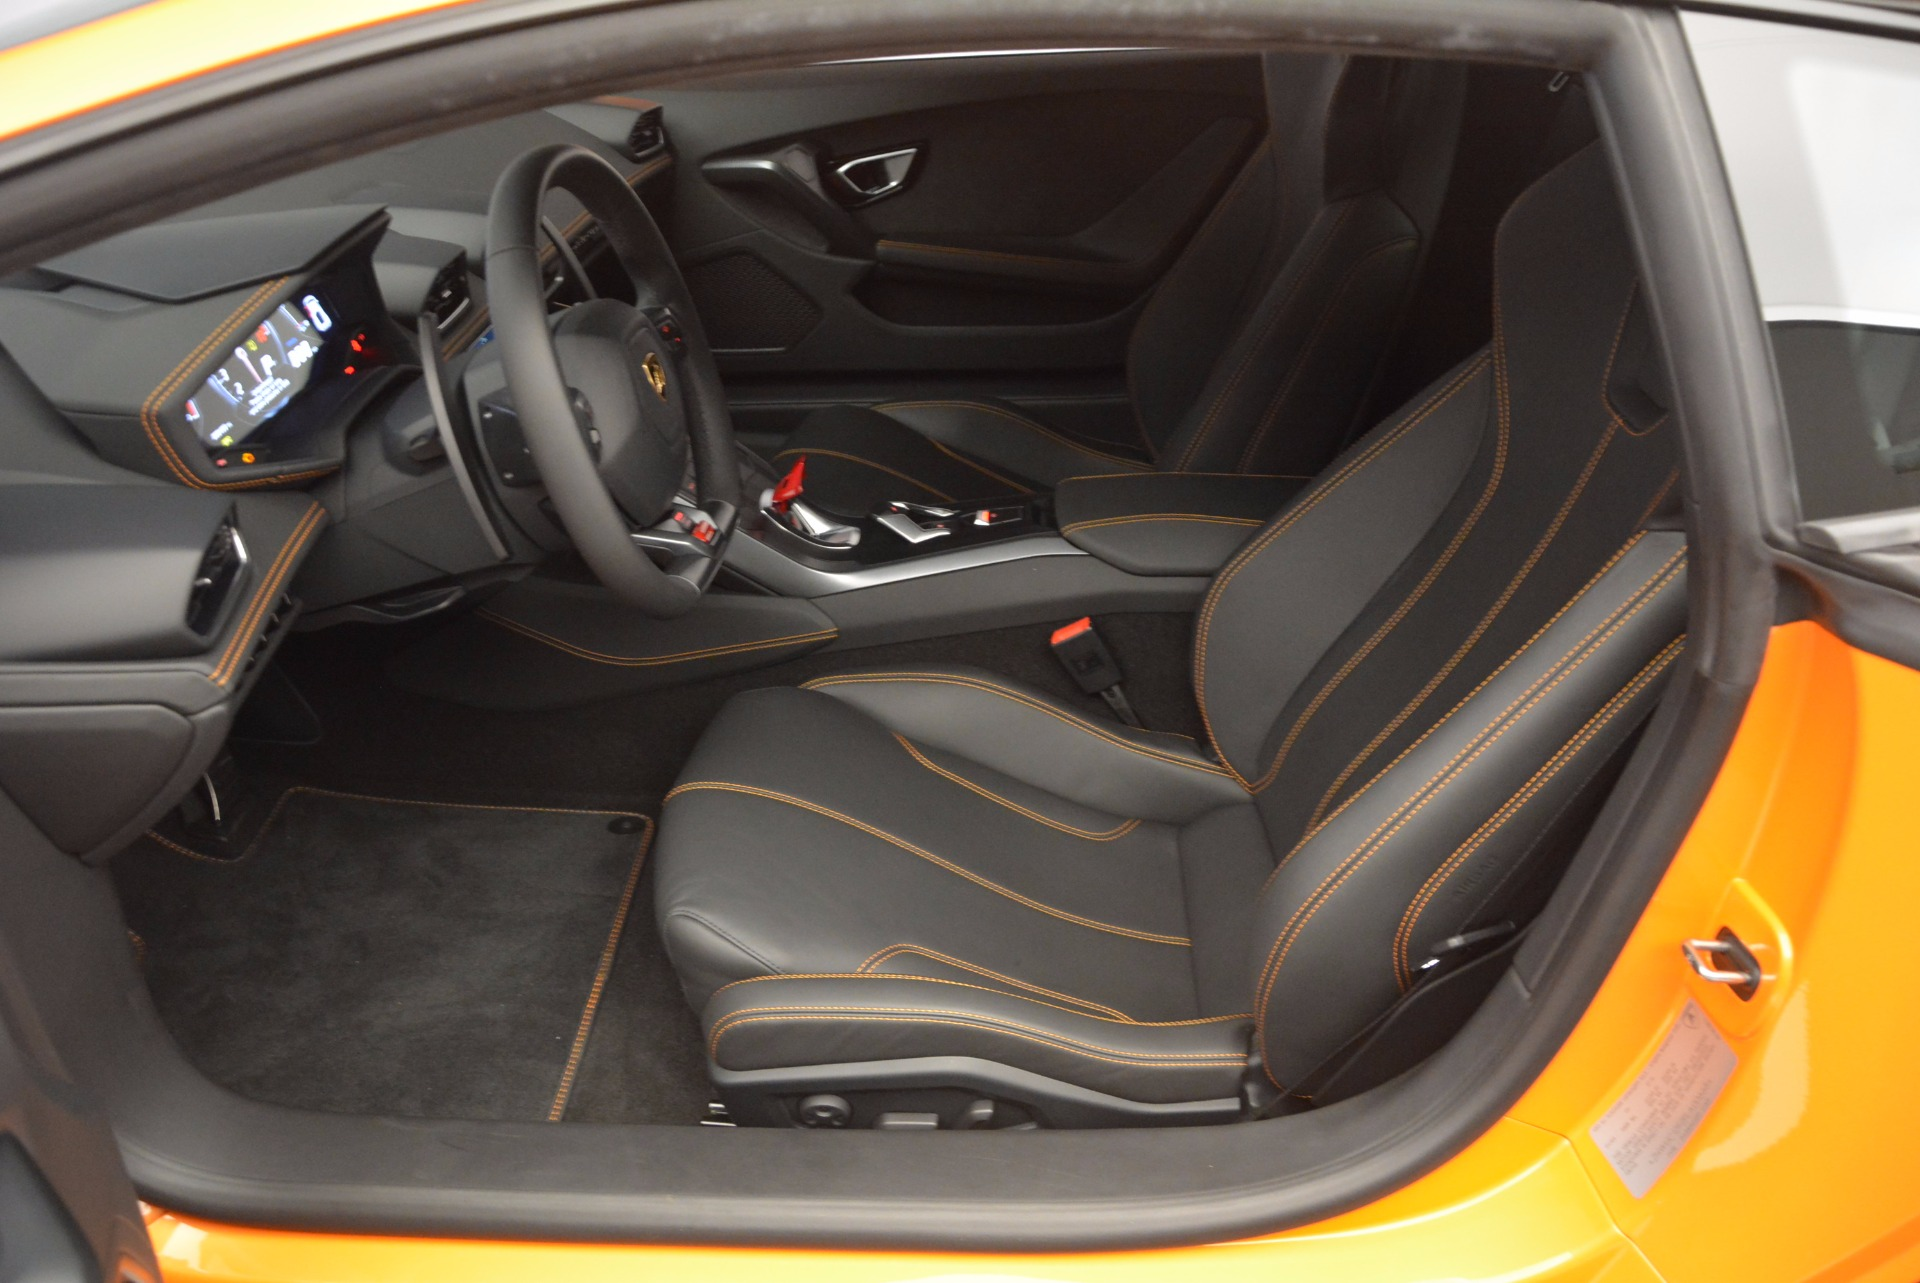 Used 2015 Lamborghini Huracan LP 610-4 For Sale In Greenwich, CT 621_p14